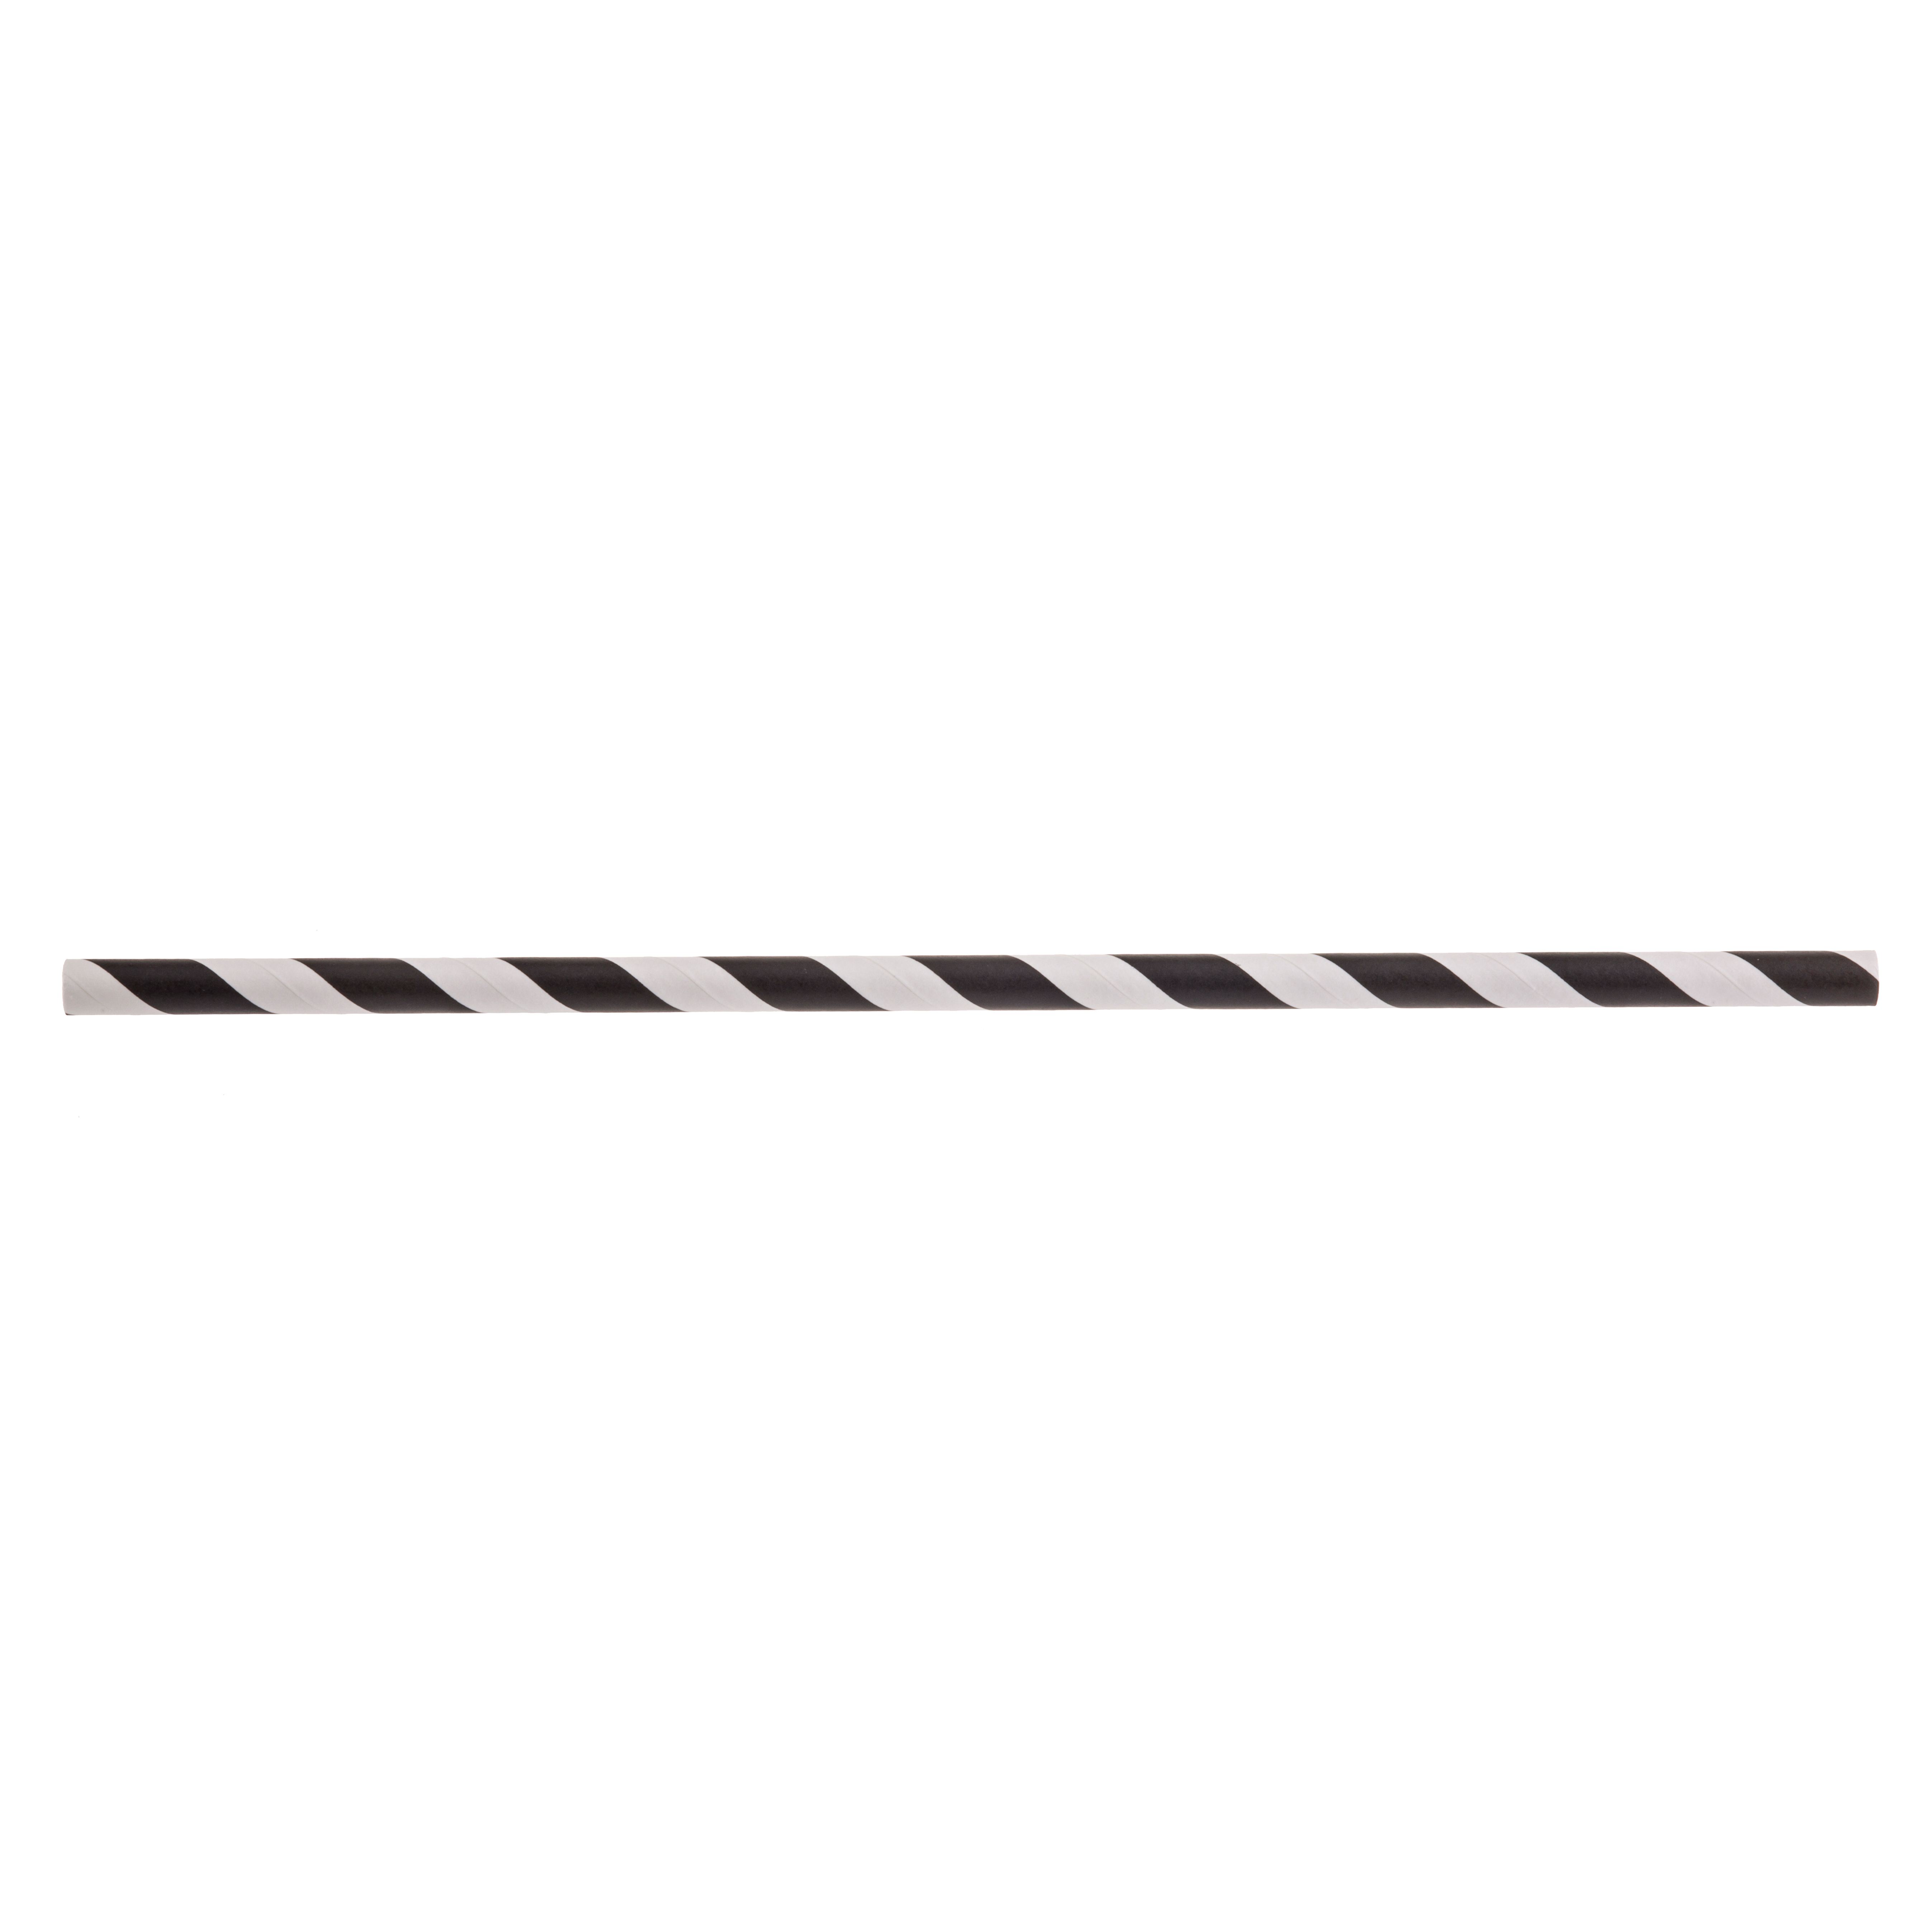 TableCraft Products 700115 straws